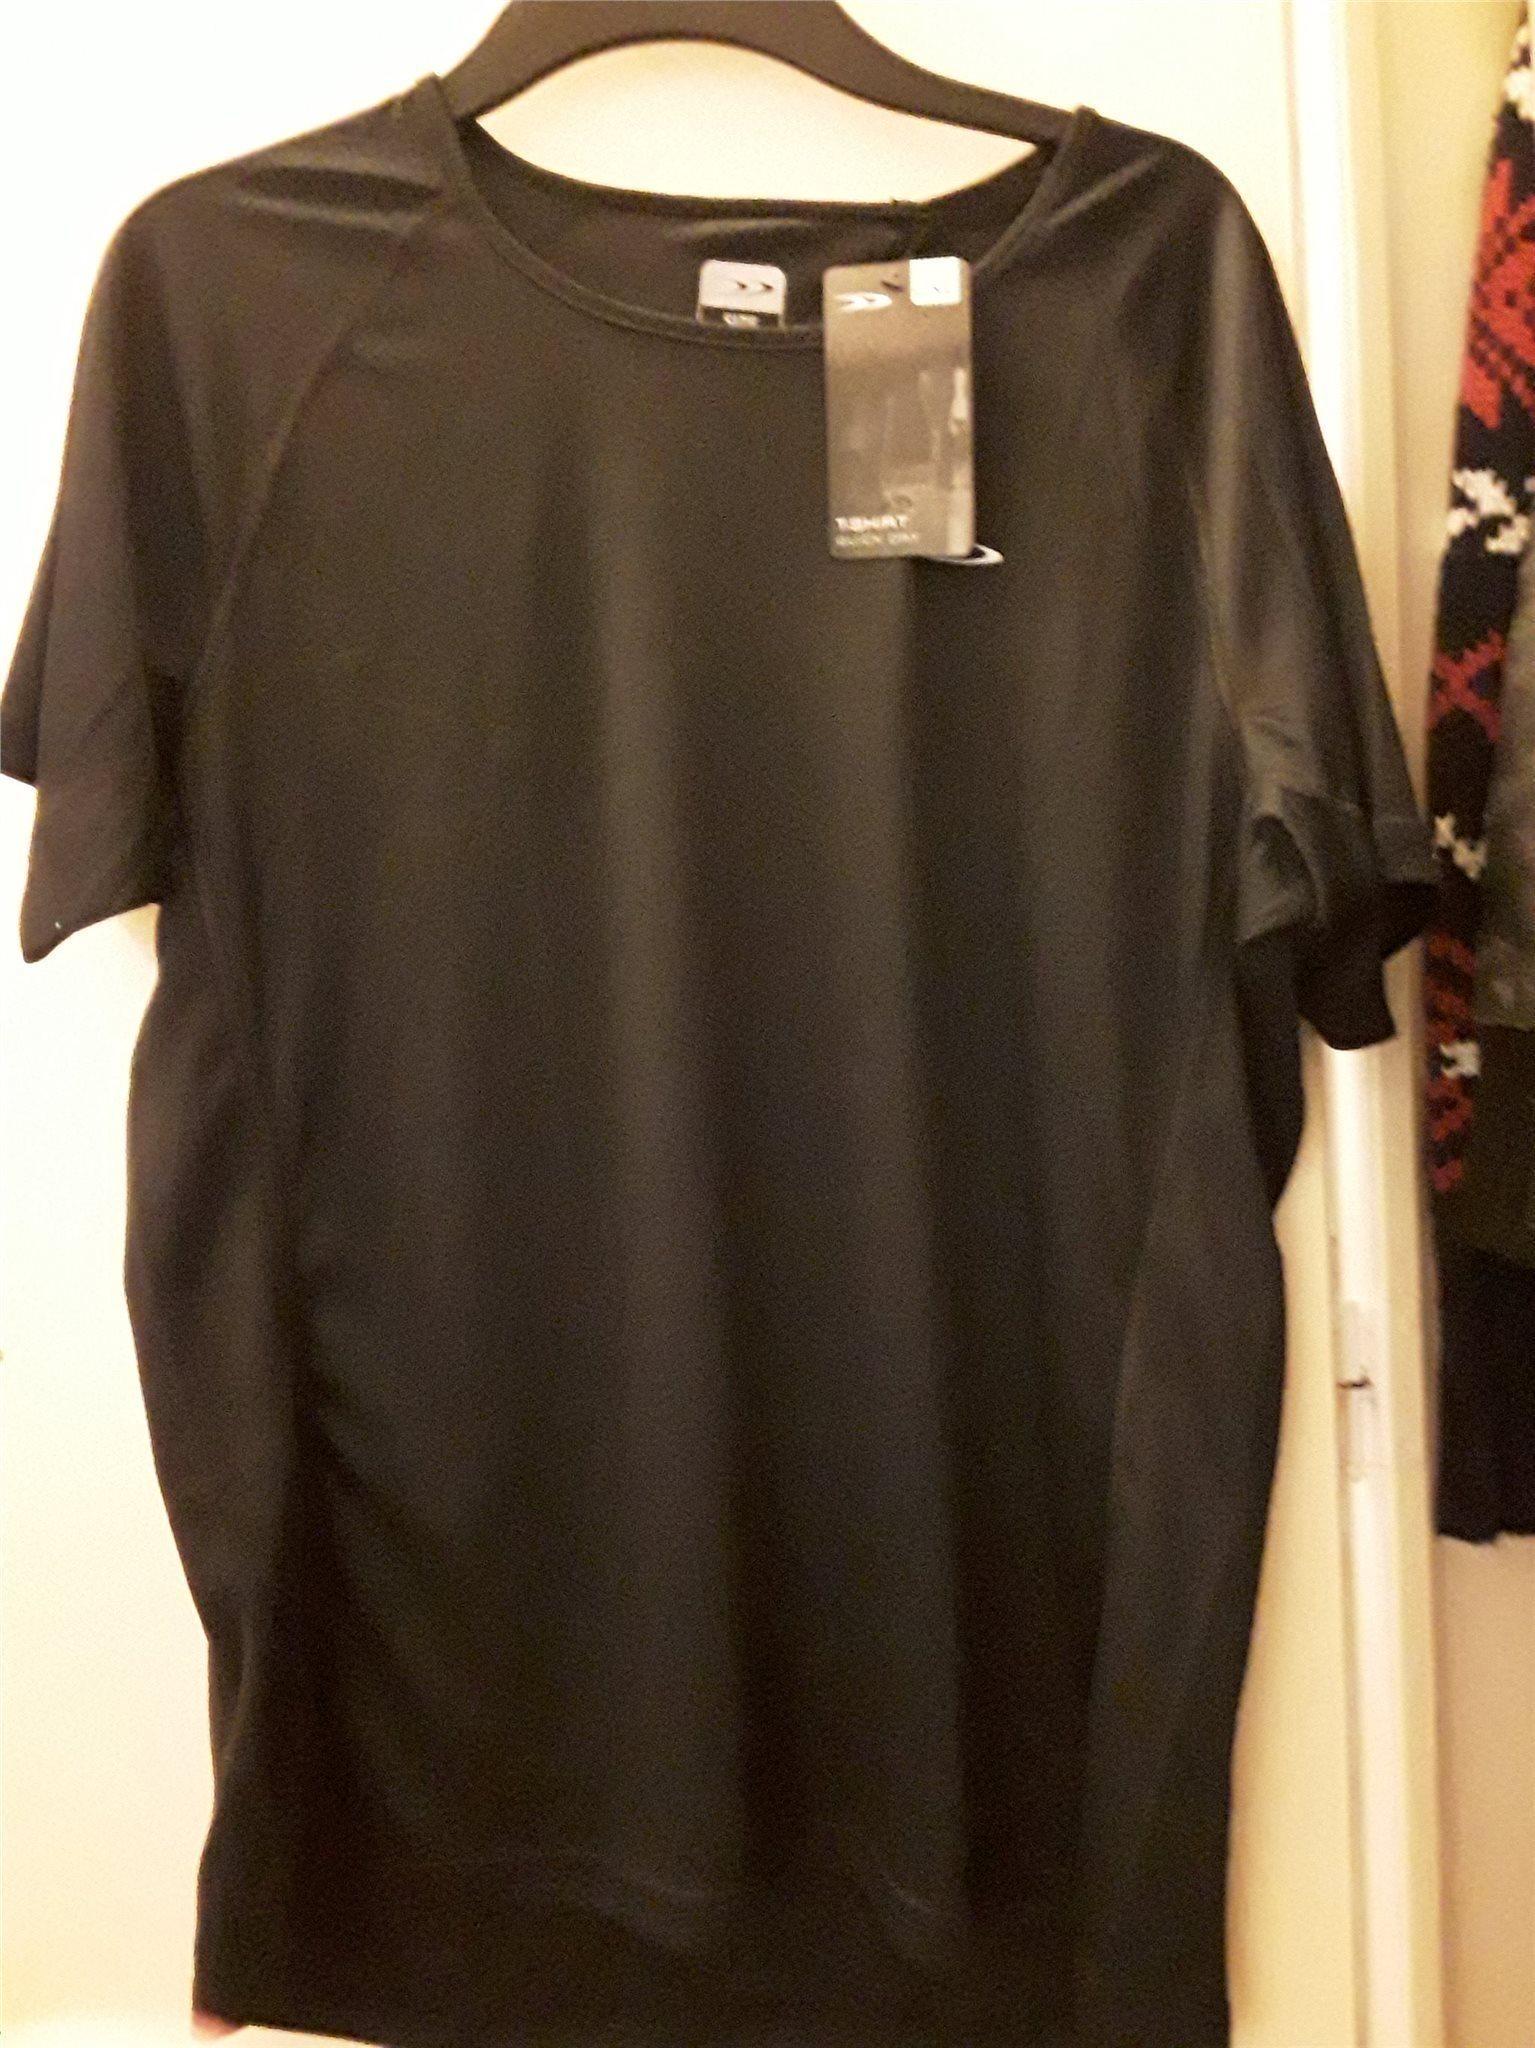 Svart sport gym t-shirt i skönt material. Ny!! .. (341690564) ᐈ Köp ... d56520cdc88b1